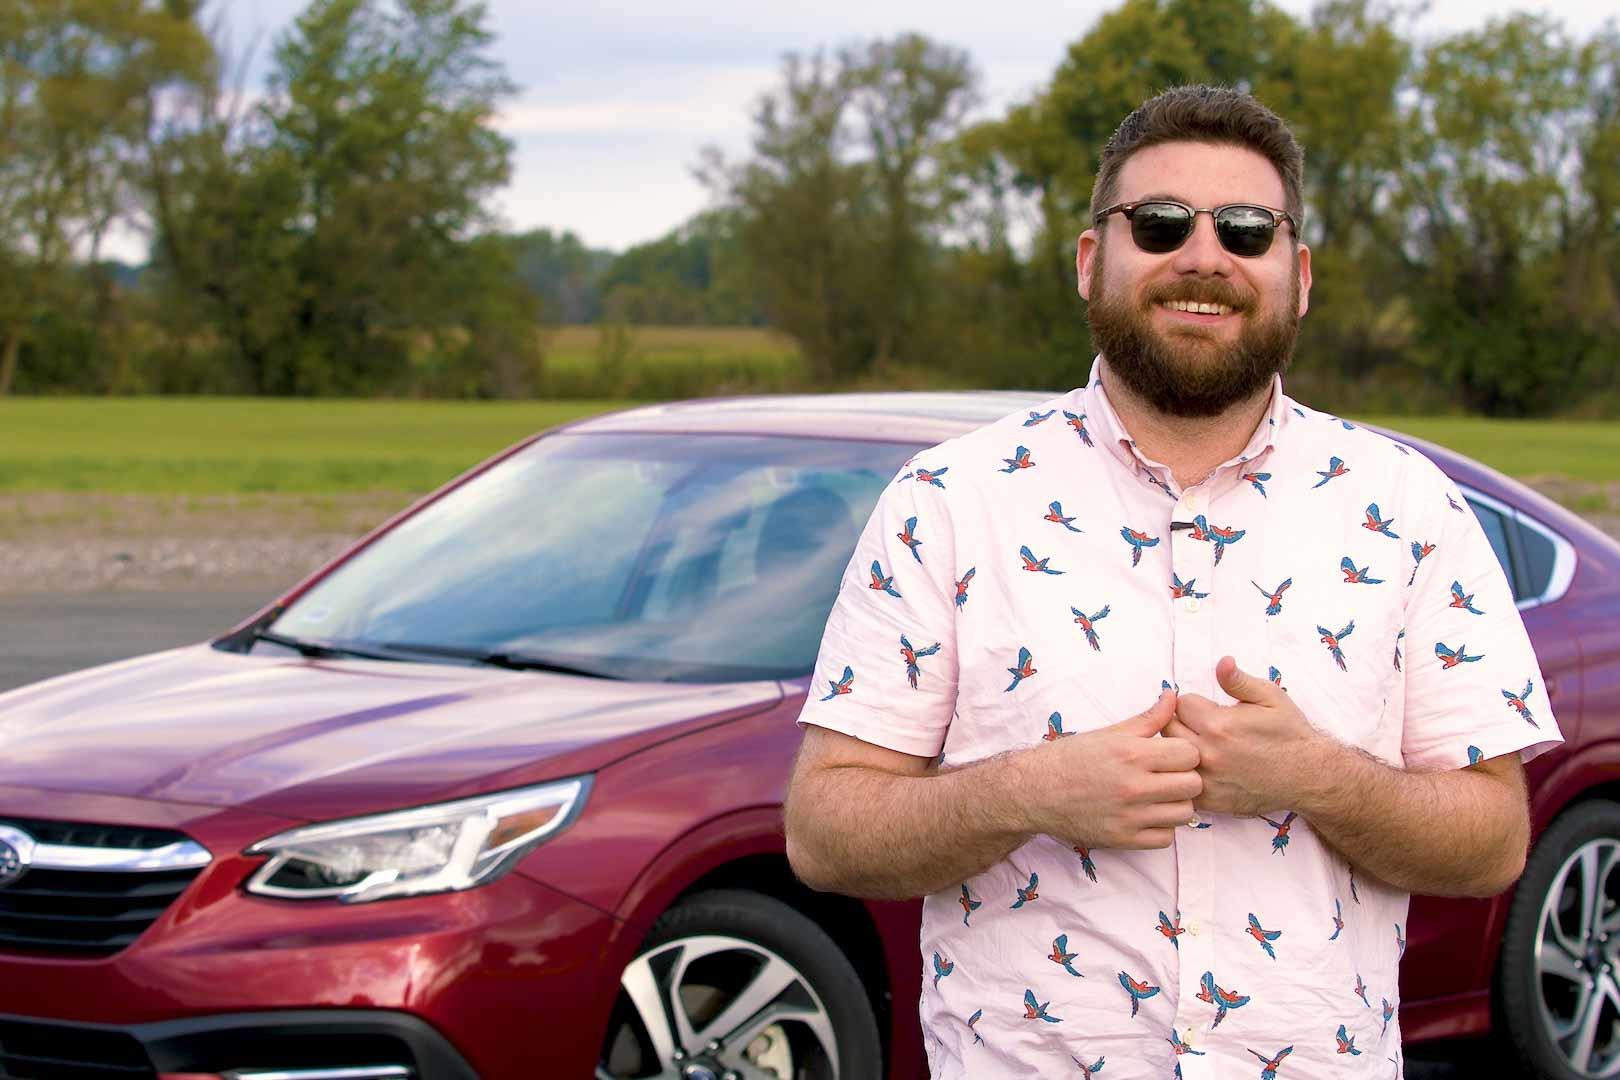 2020 Subaru Legacy Video: Still Bland, But Getting Better via @carsdotcom